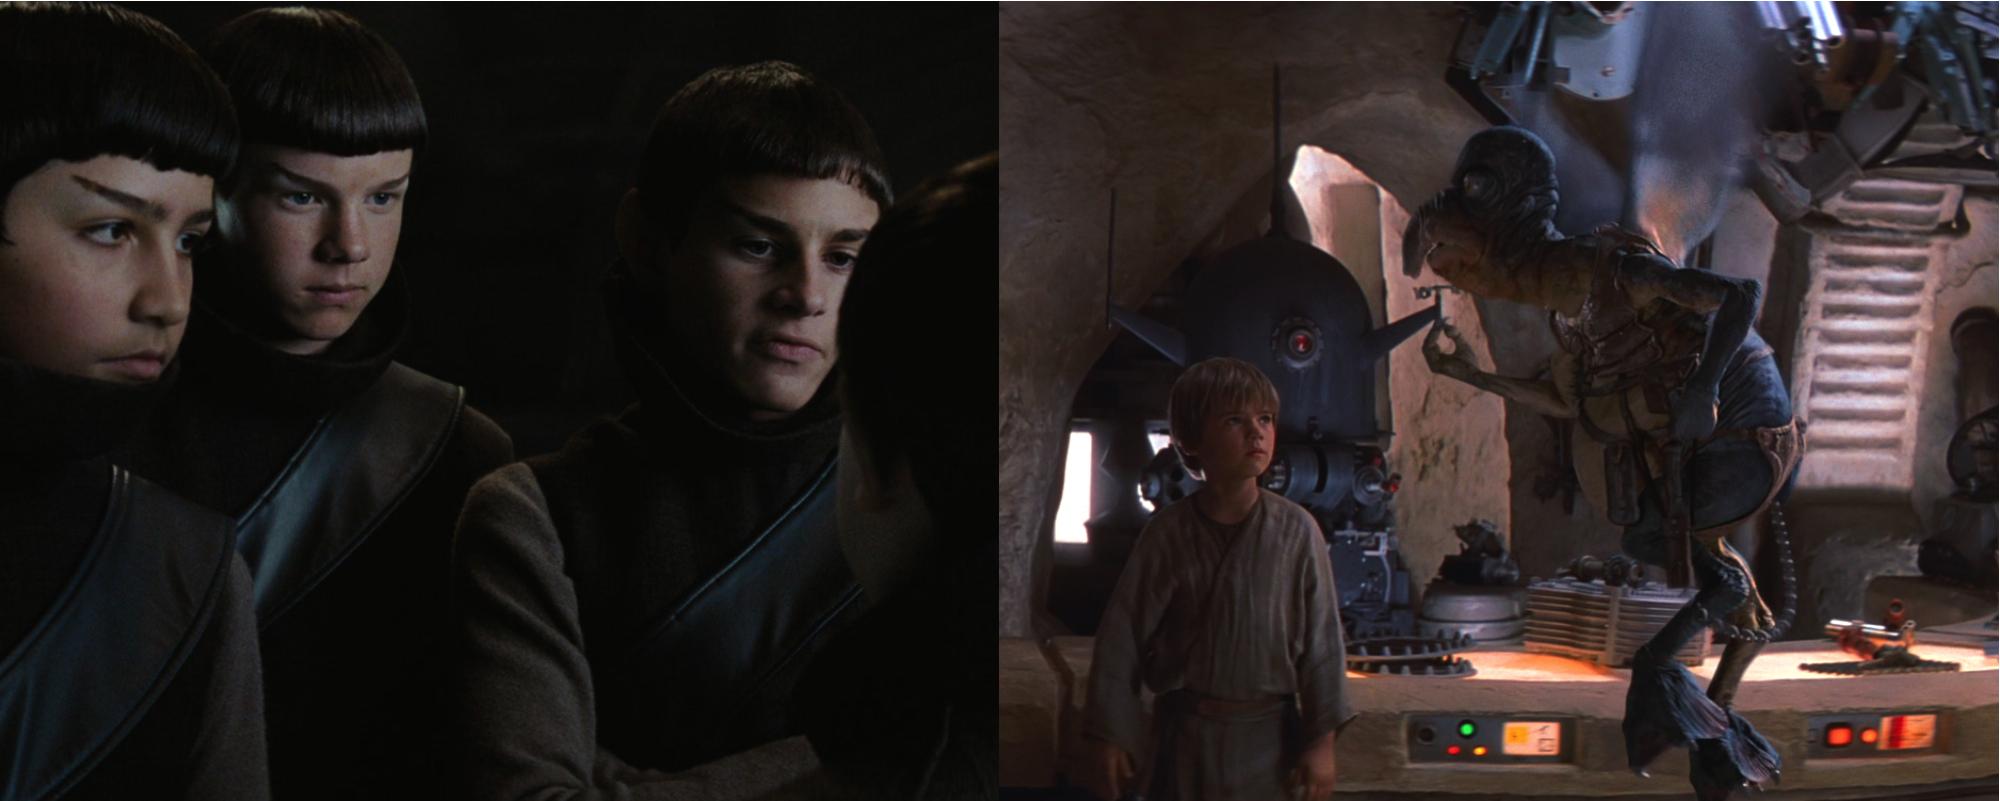 Star Trek's Spock, Star Wars's Anakin and Watto